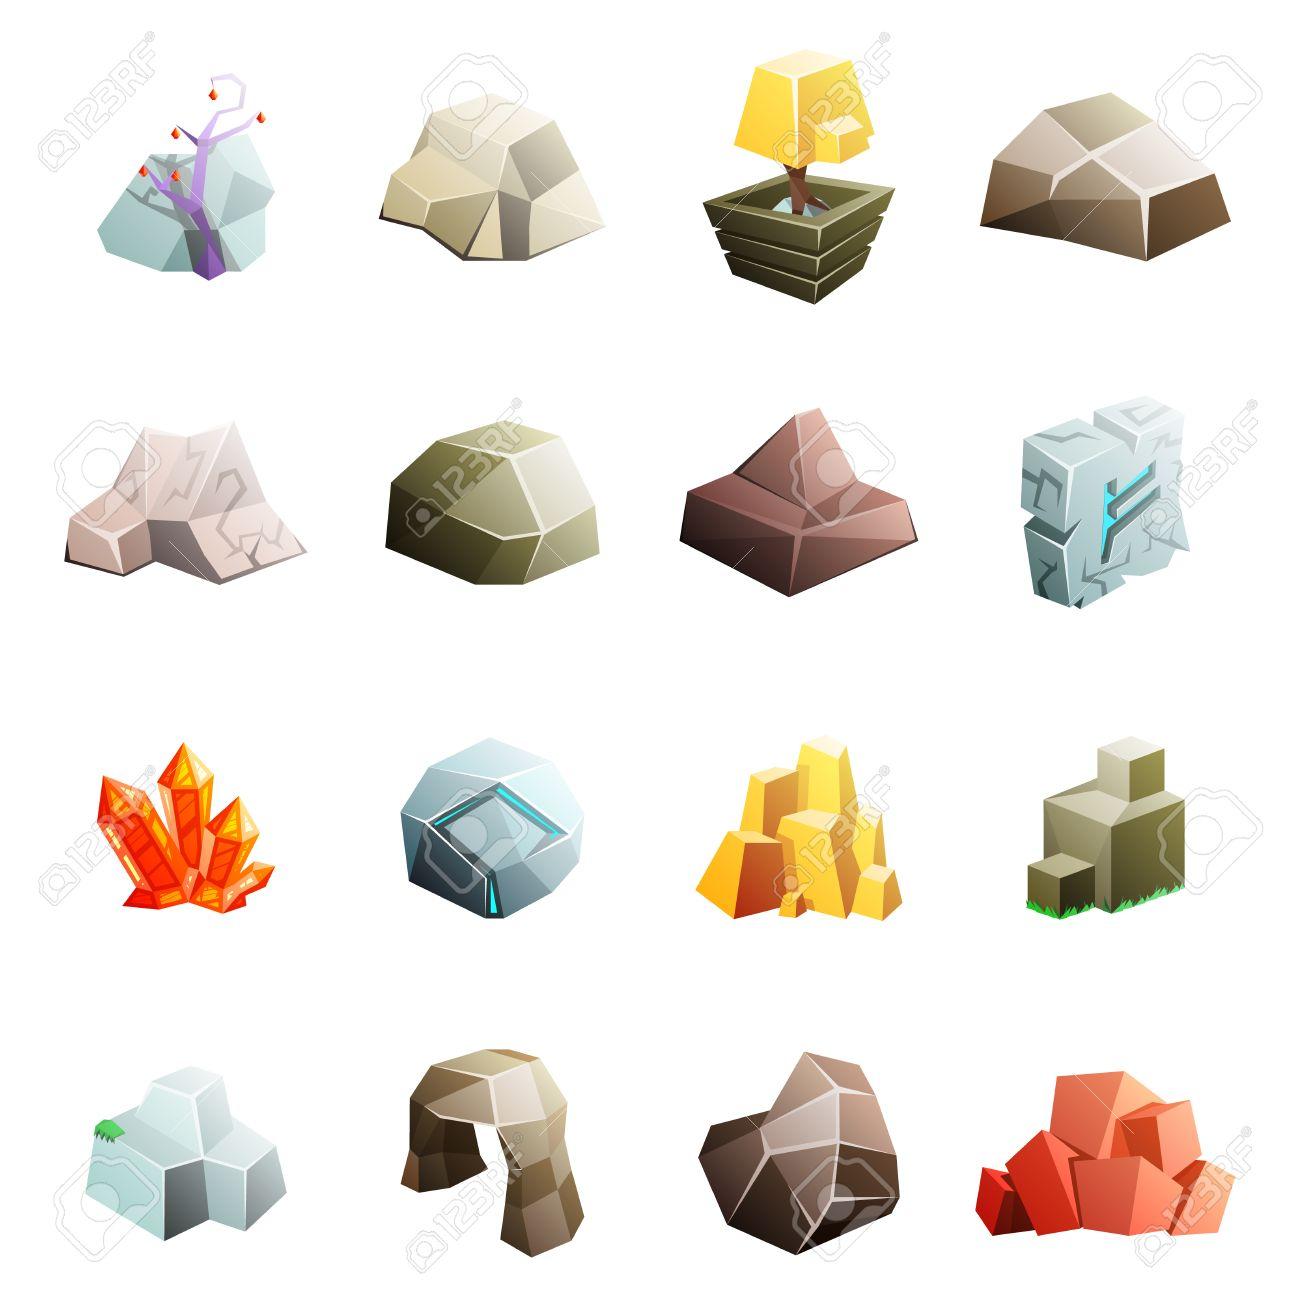 Game art environment low poly rock stone boulder cave cristal